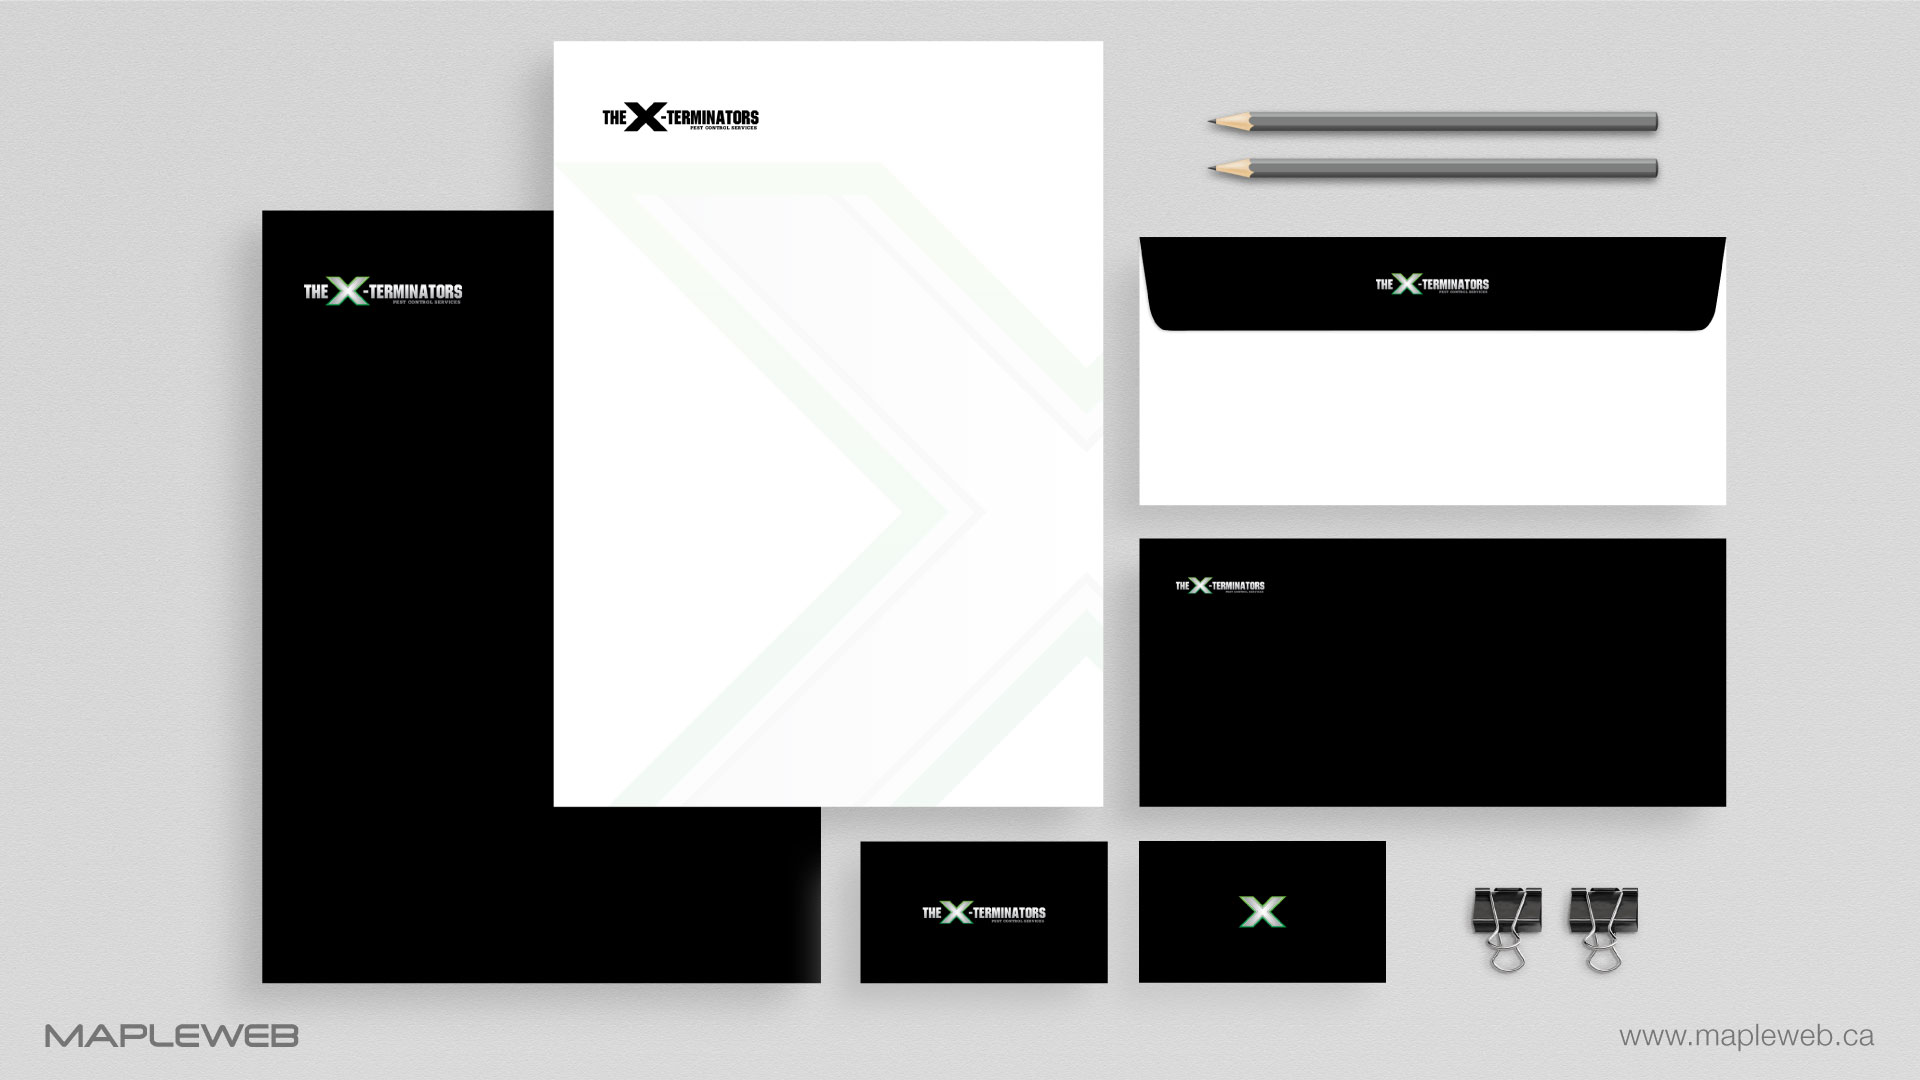 the-x-terminators-brand-logo-design-by-mapleweb-vancouver-canada-stationery-mock